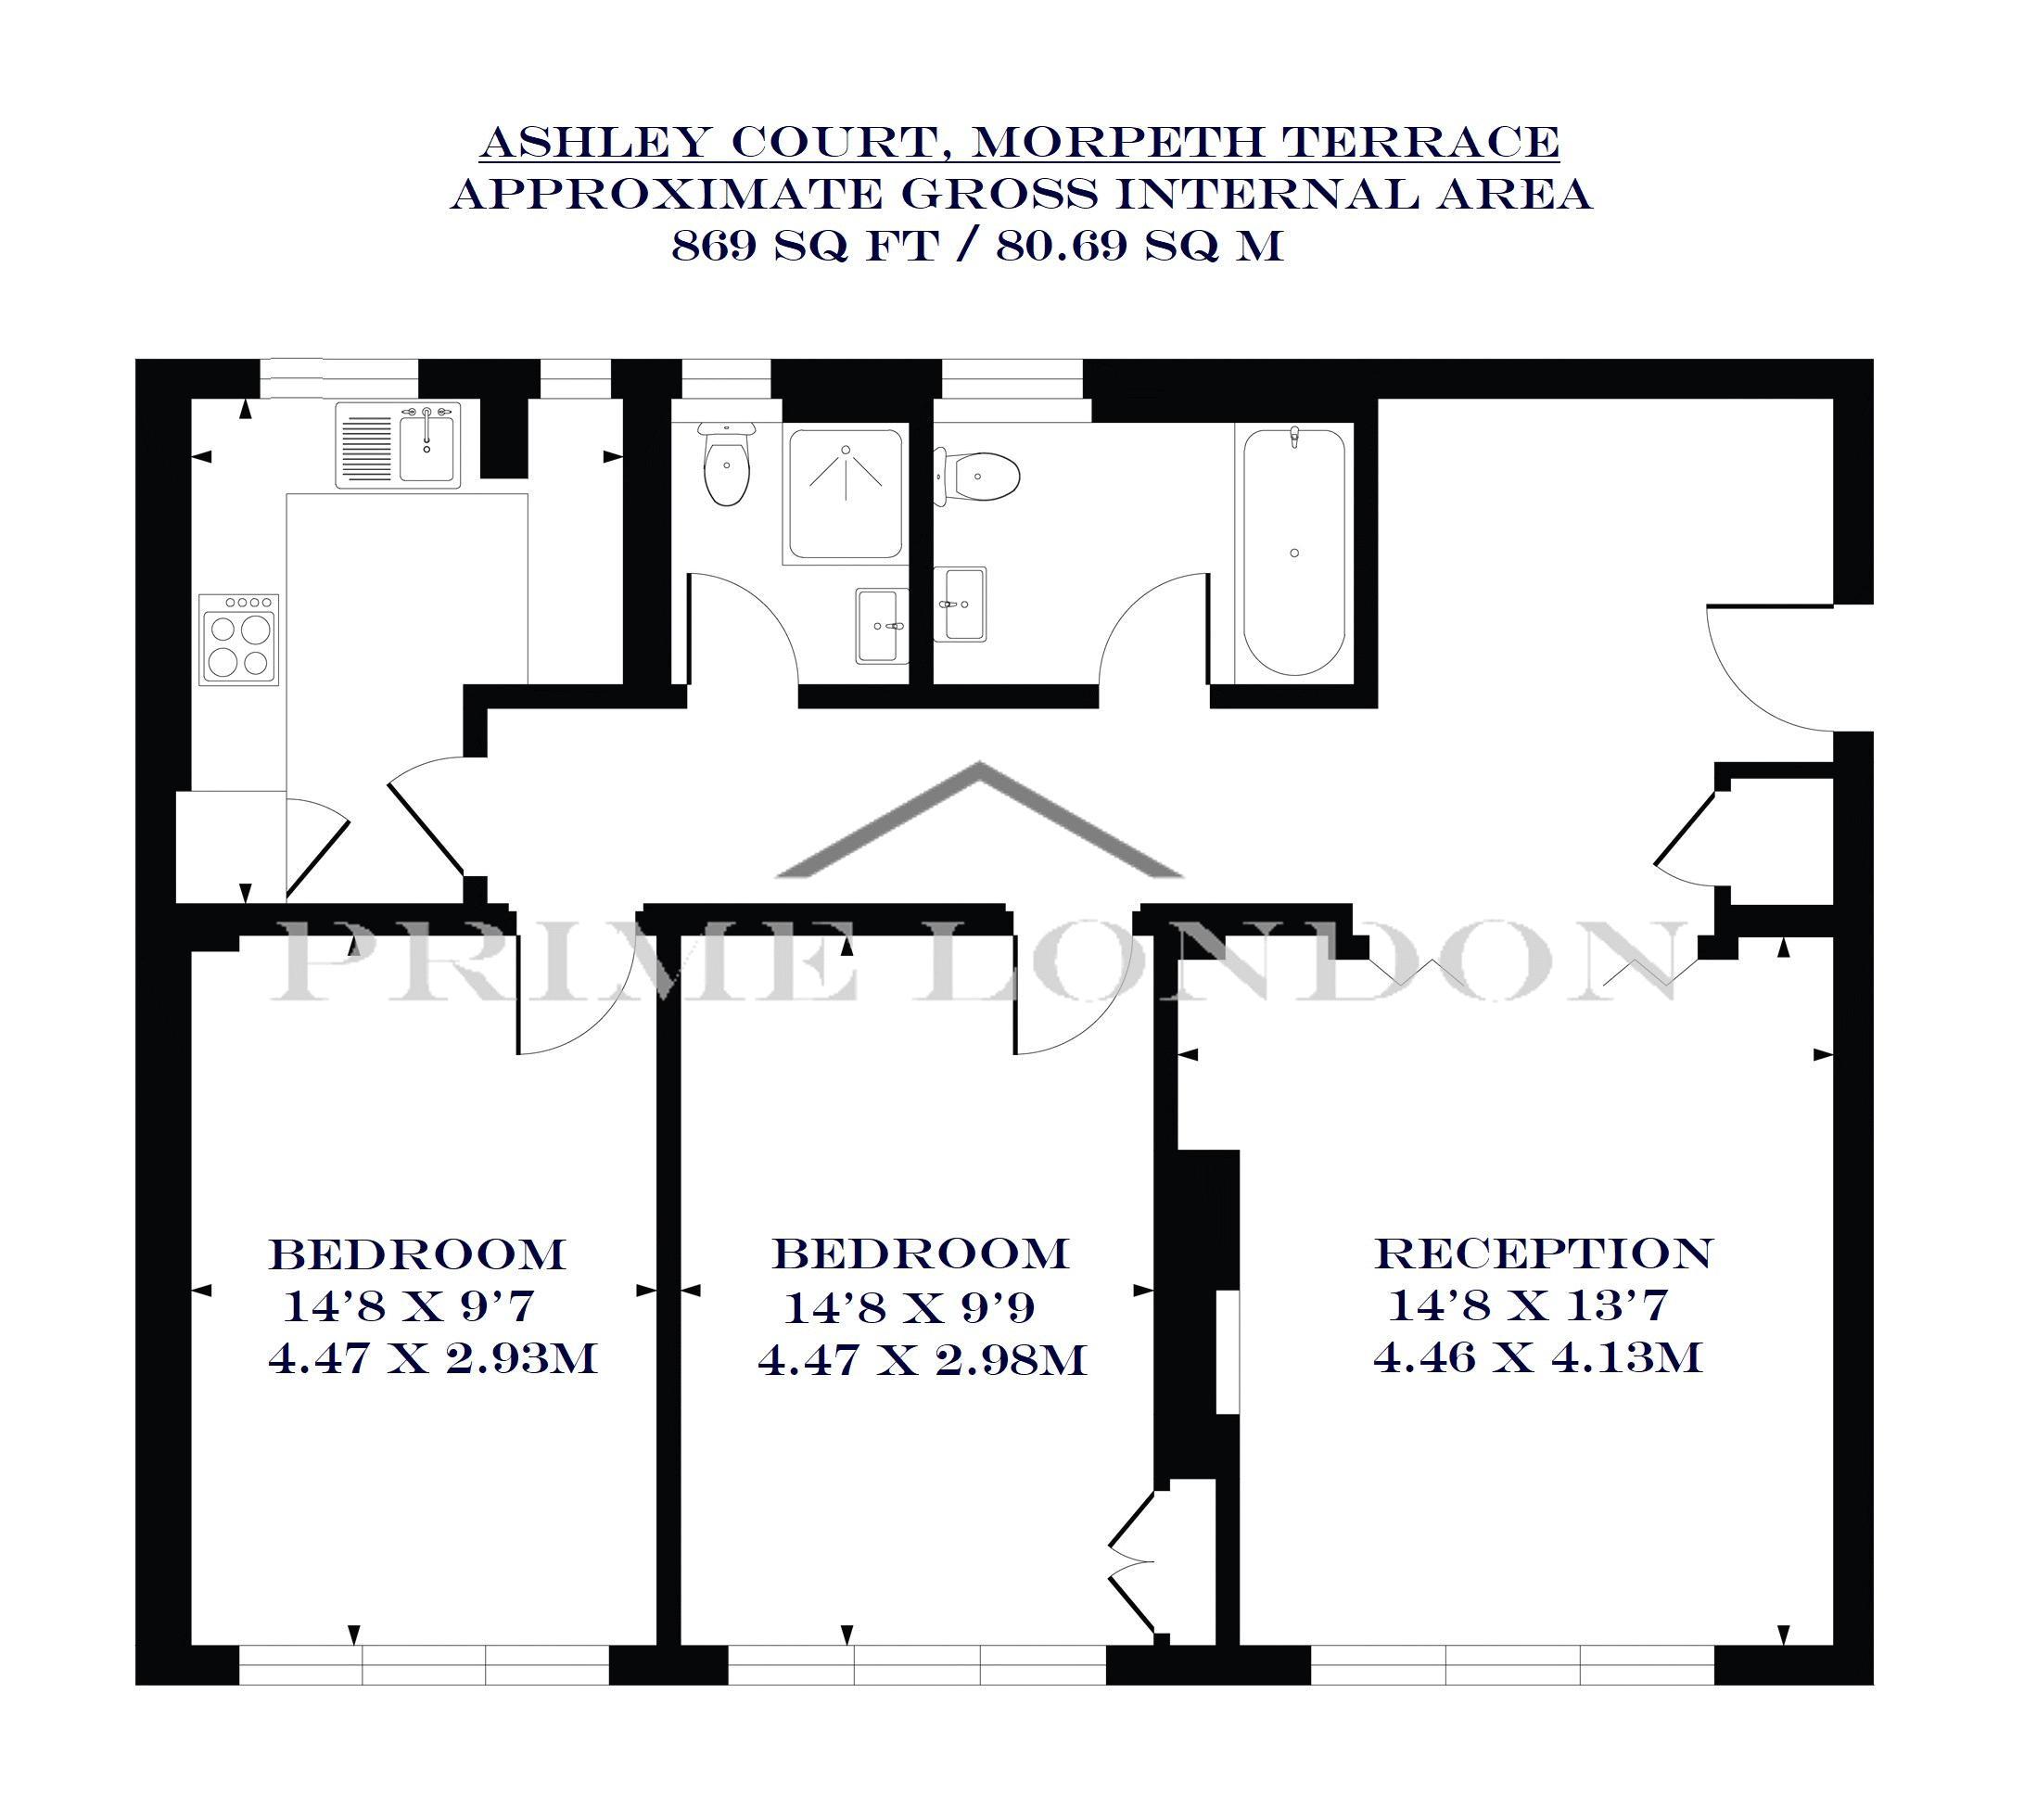 Ashley Court Morpeth Terrace